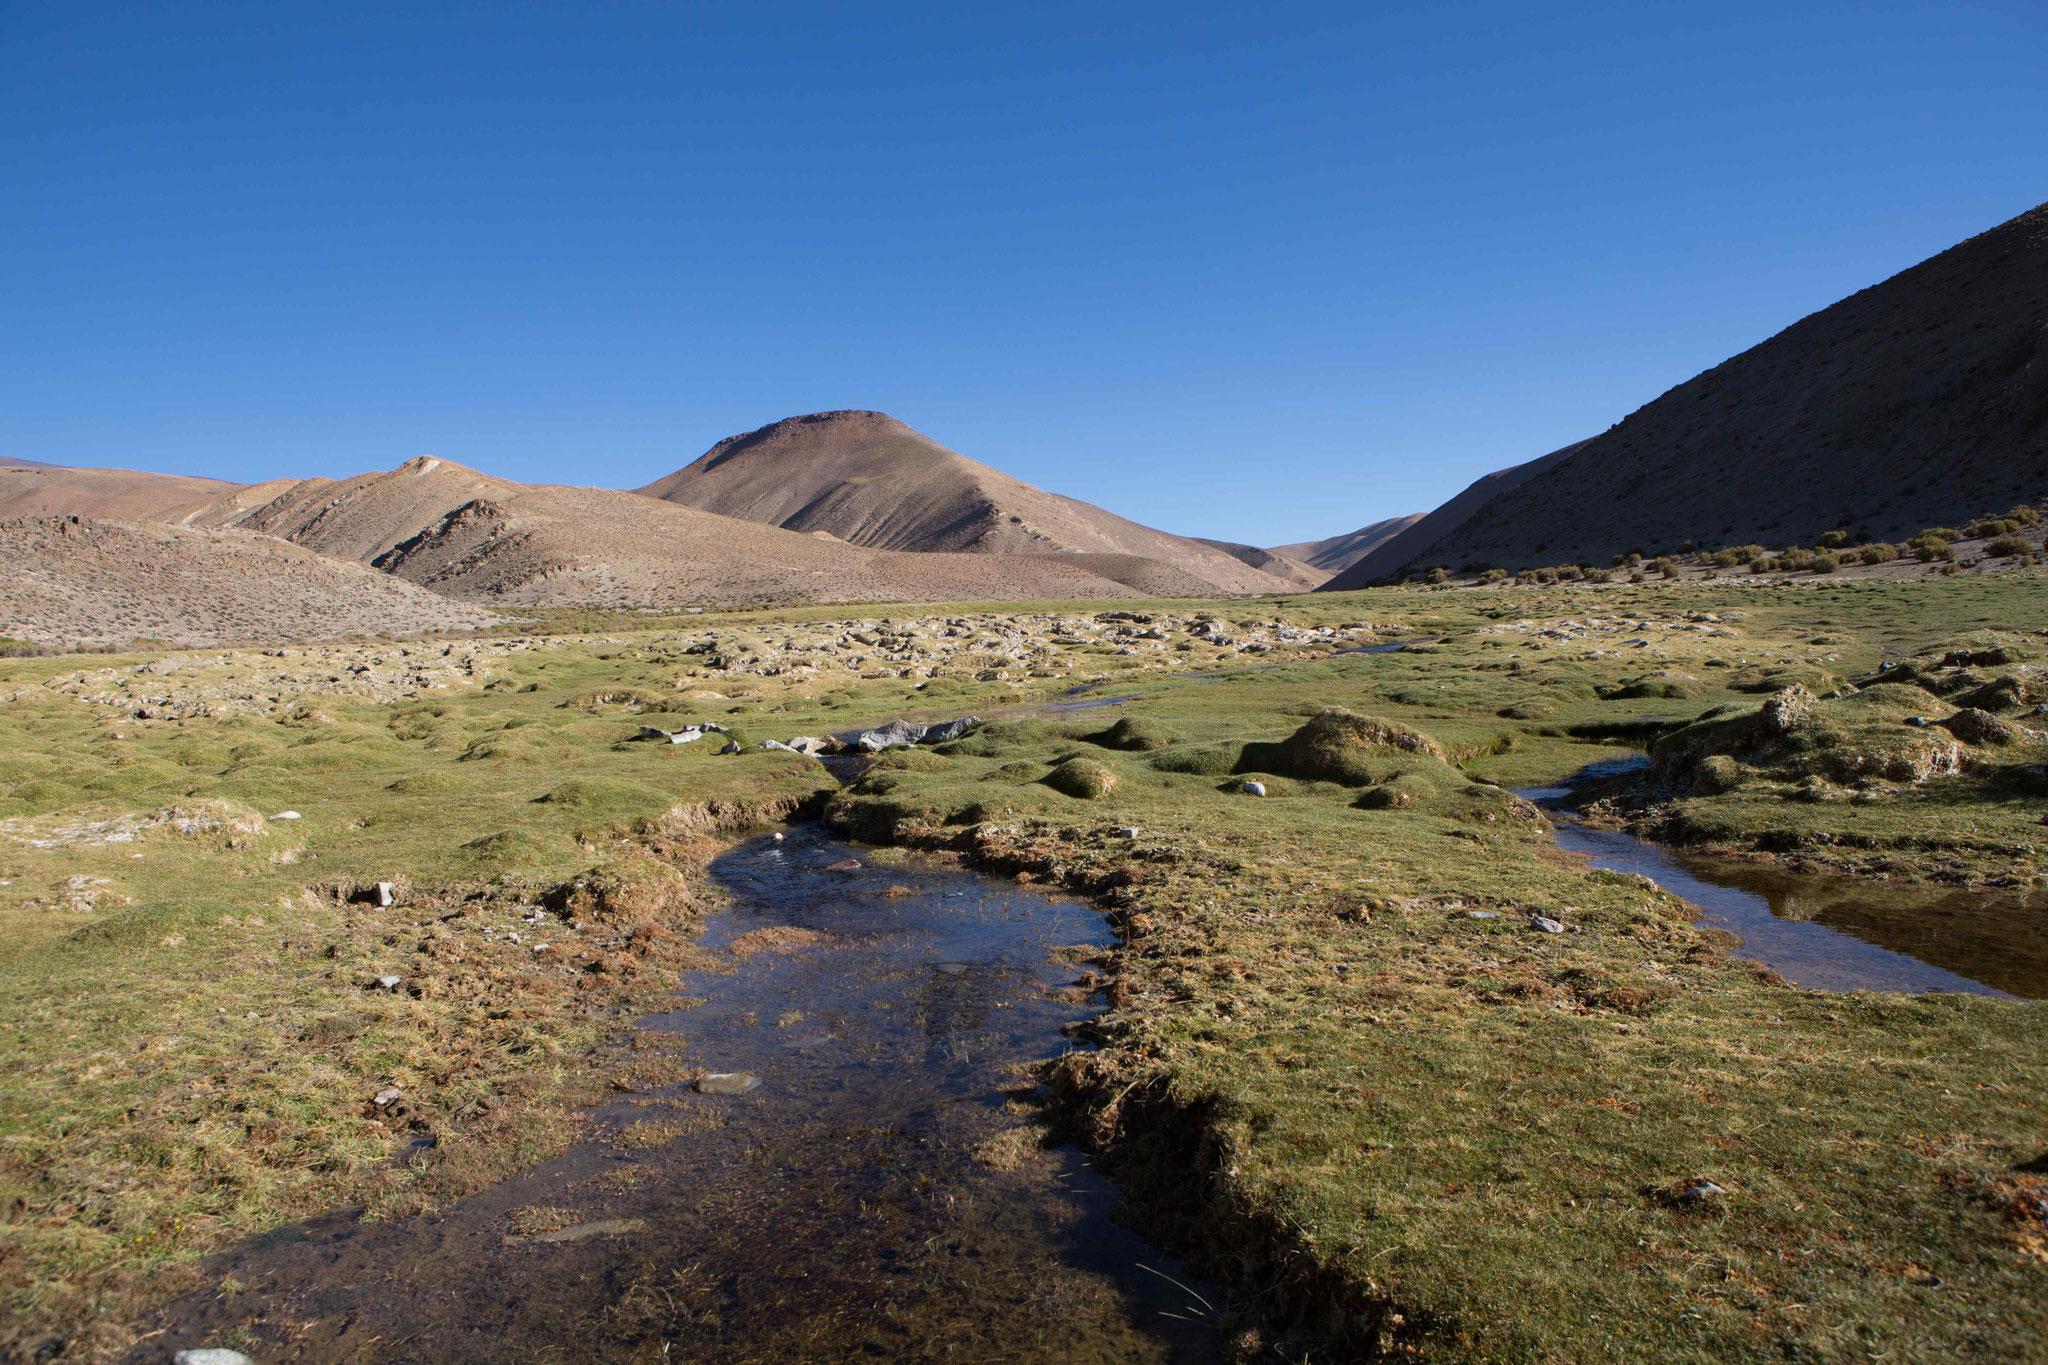 Quebrada de Calalaste